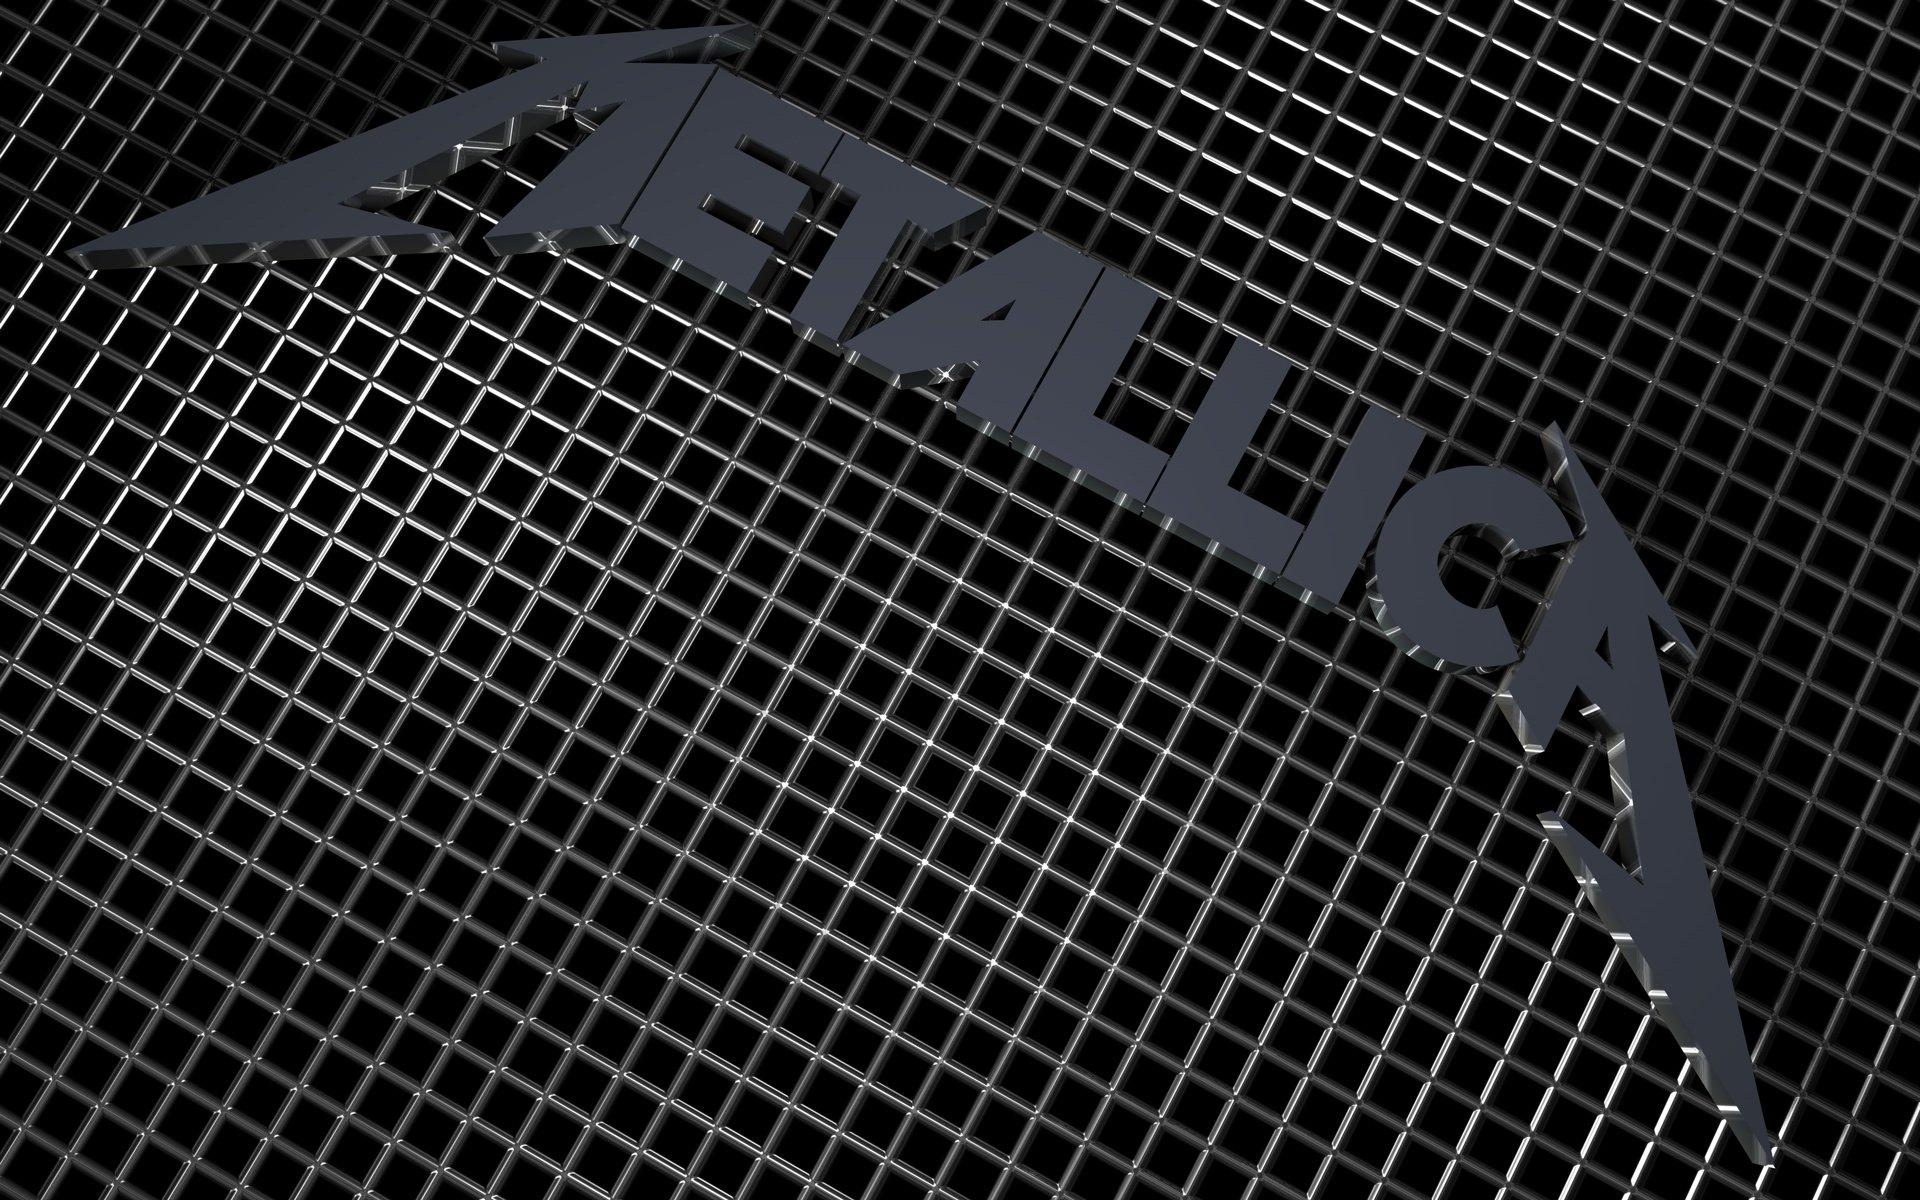 Wallpapers With Inspirational Quotes Free Download Metallica Logo Wallpapers Pixelstalk Net